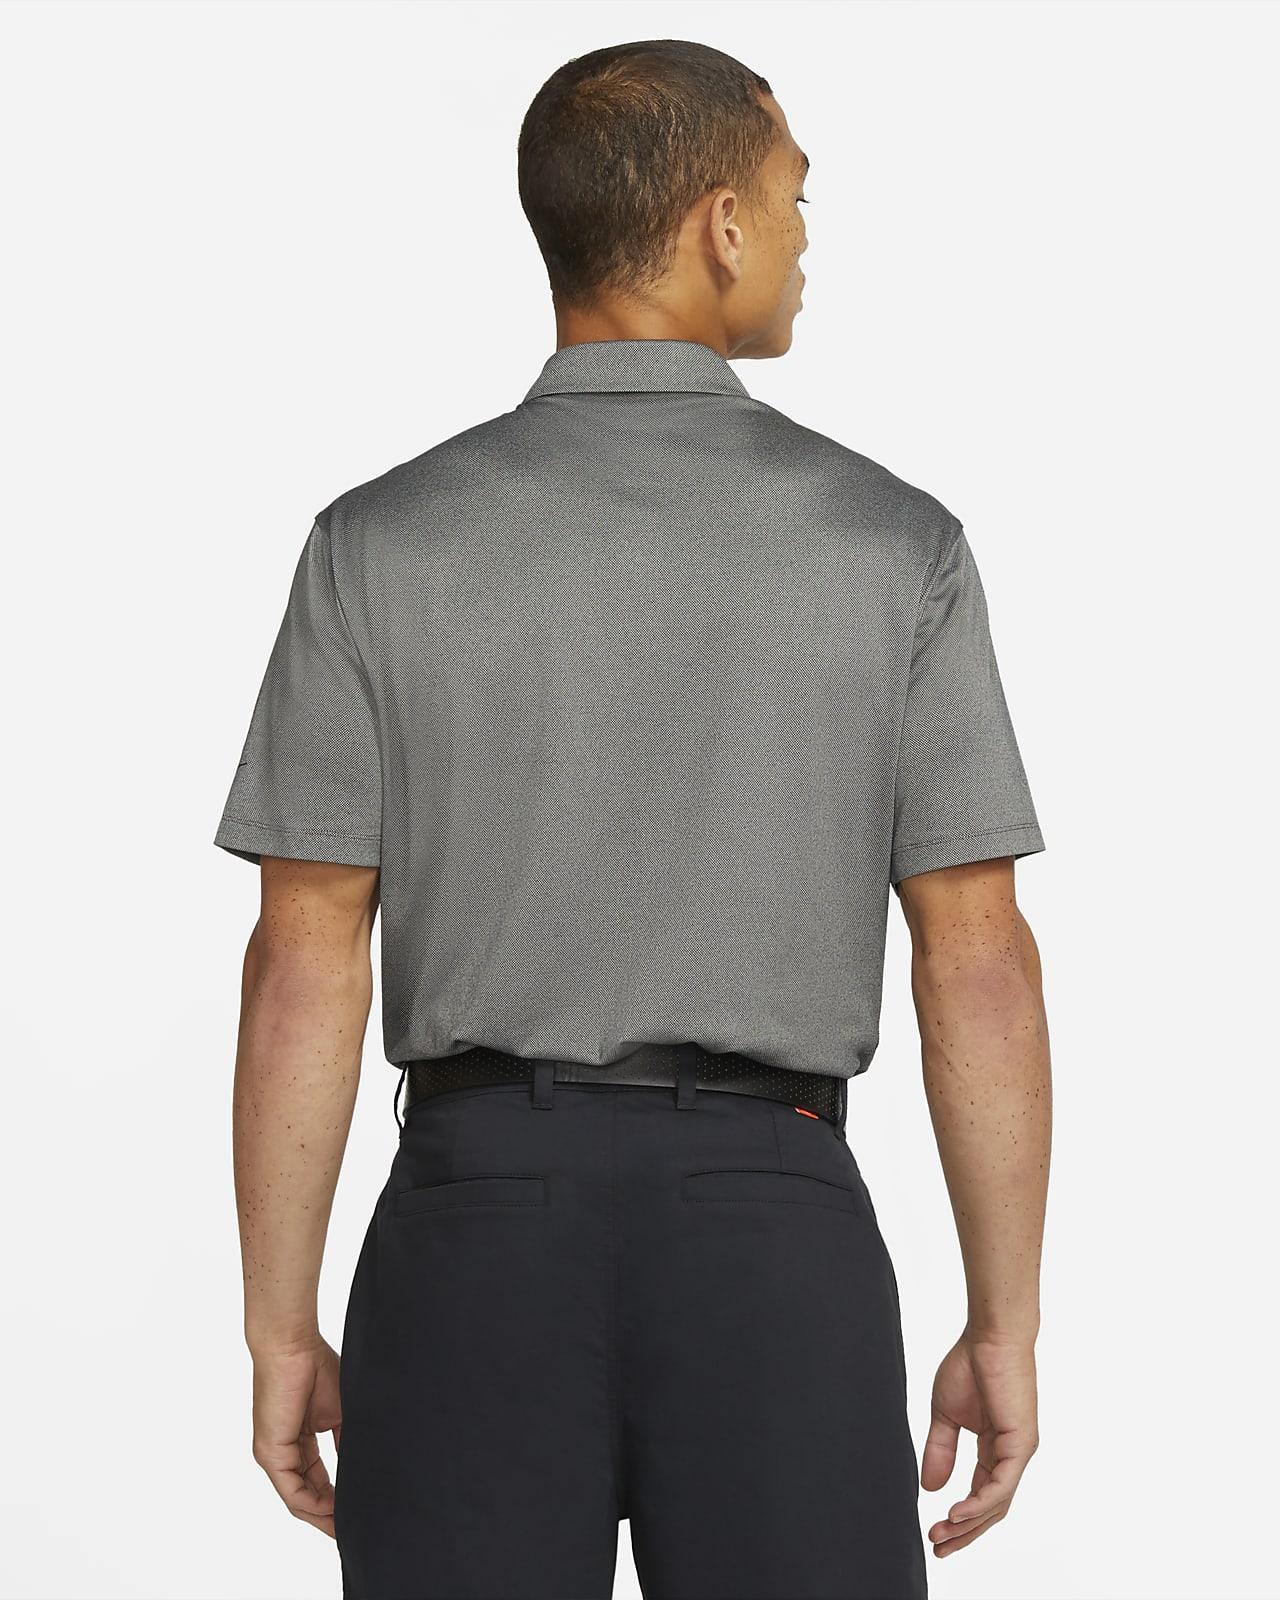 Nike Dri-FIT Vapor Men's Textured Golf Polo